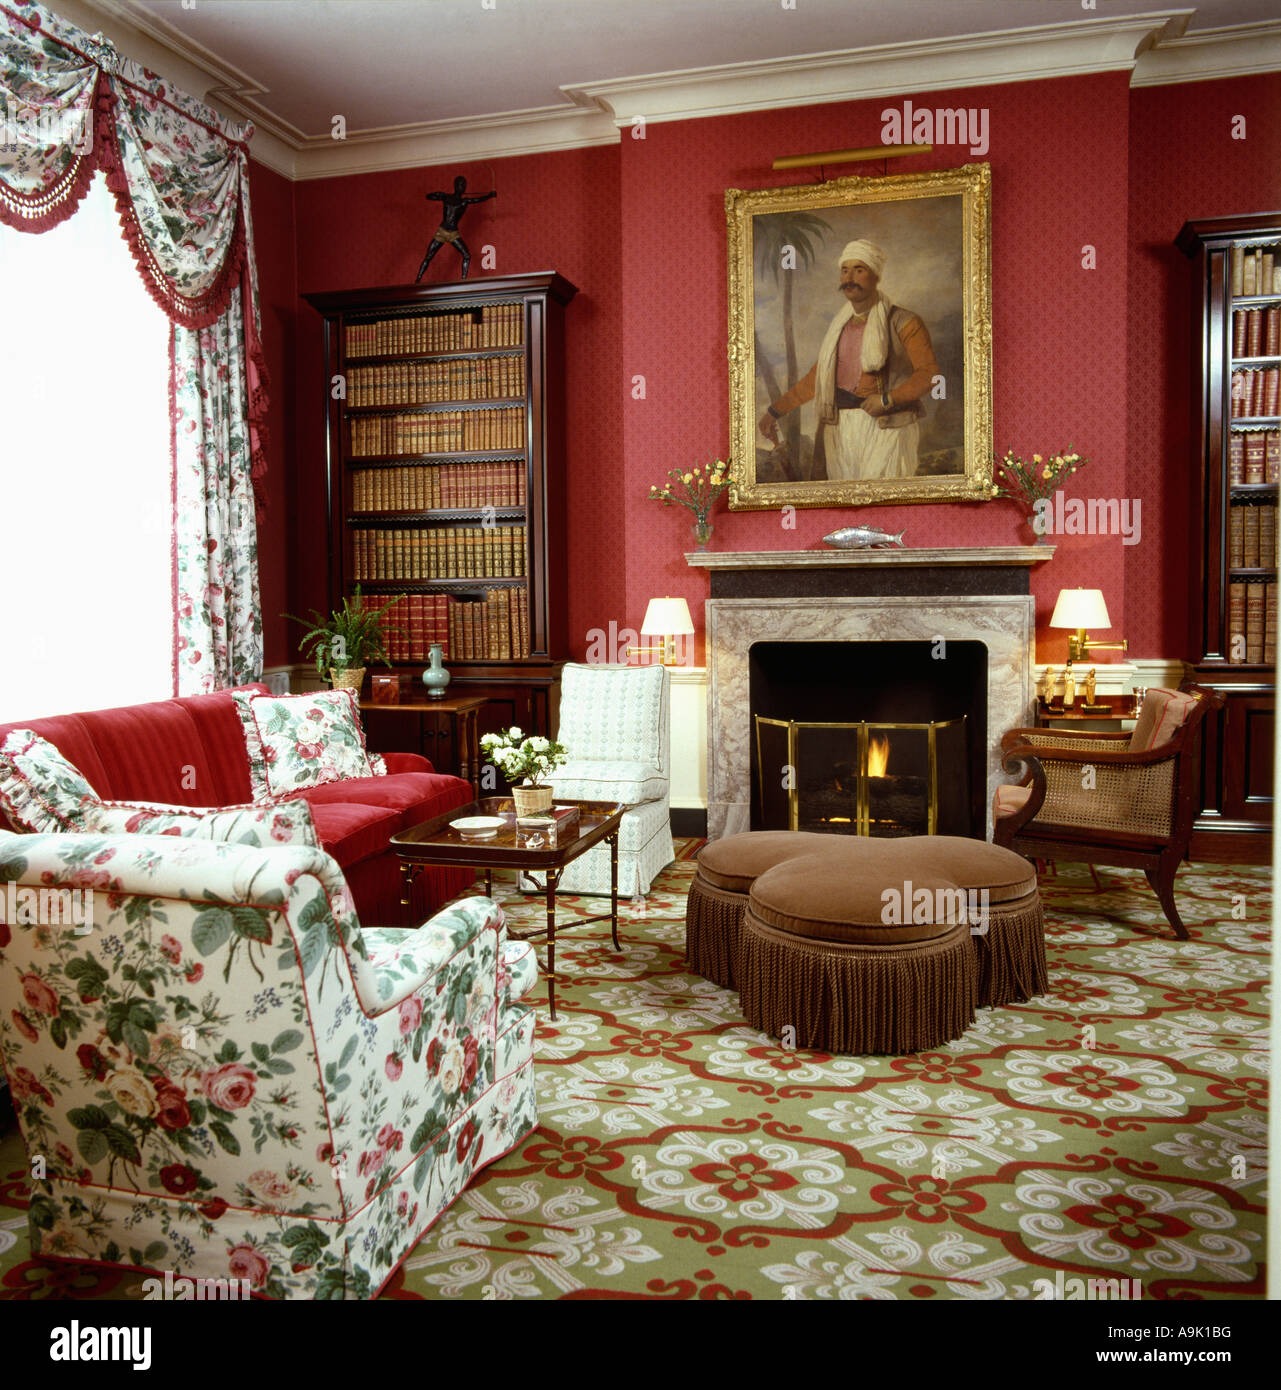 Patterned Carpets For Living Room Carpet Vidalondon